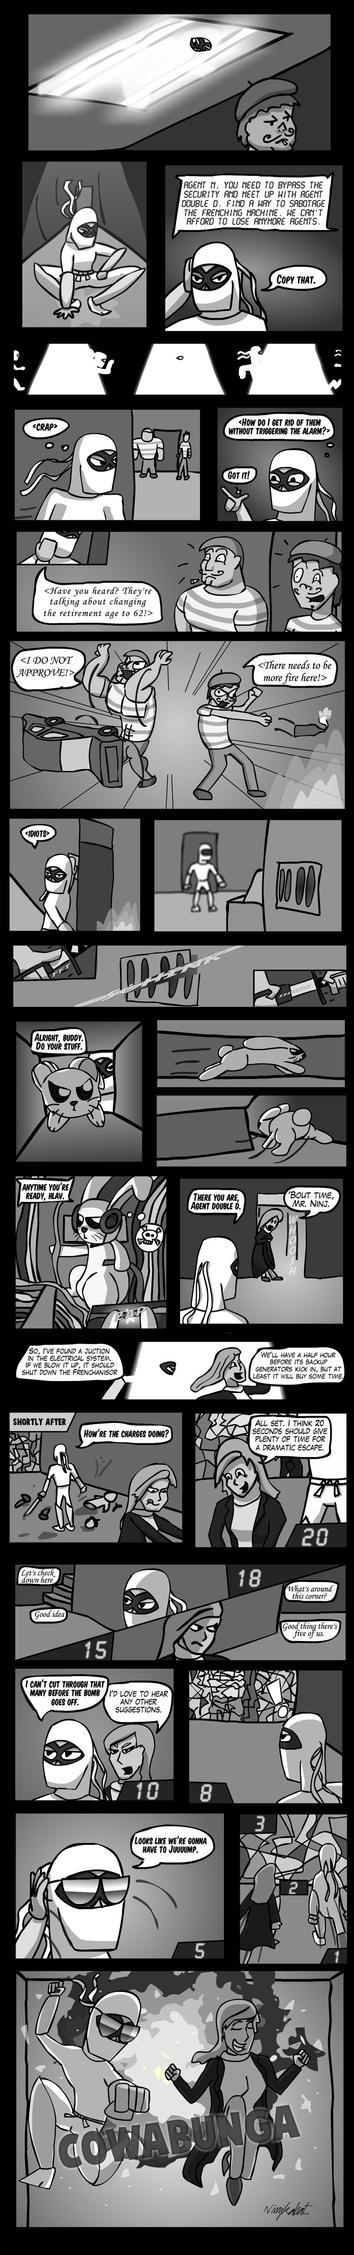 SB: Comic Jam 1 by ninjkabat